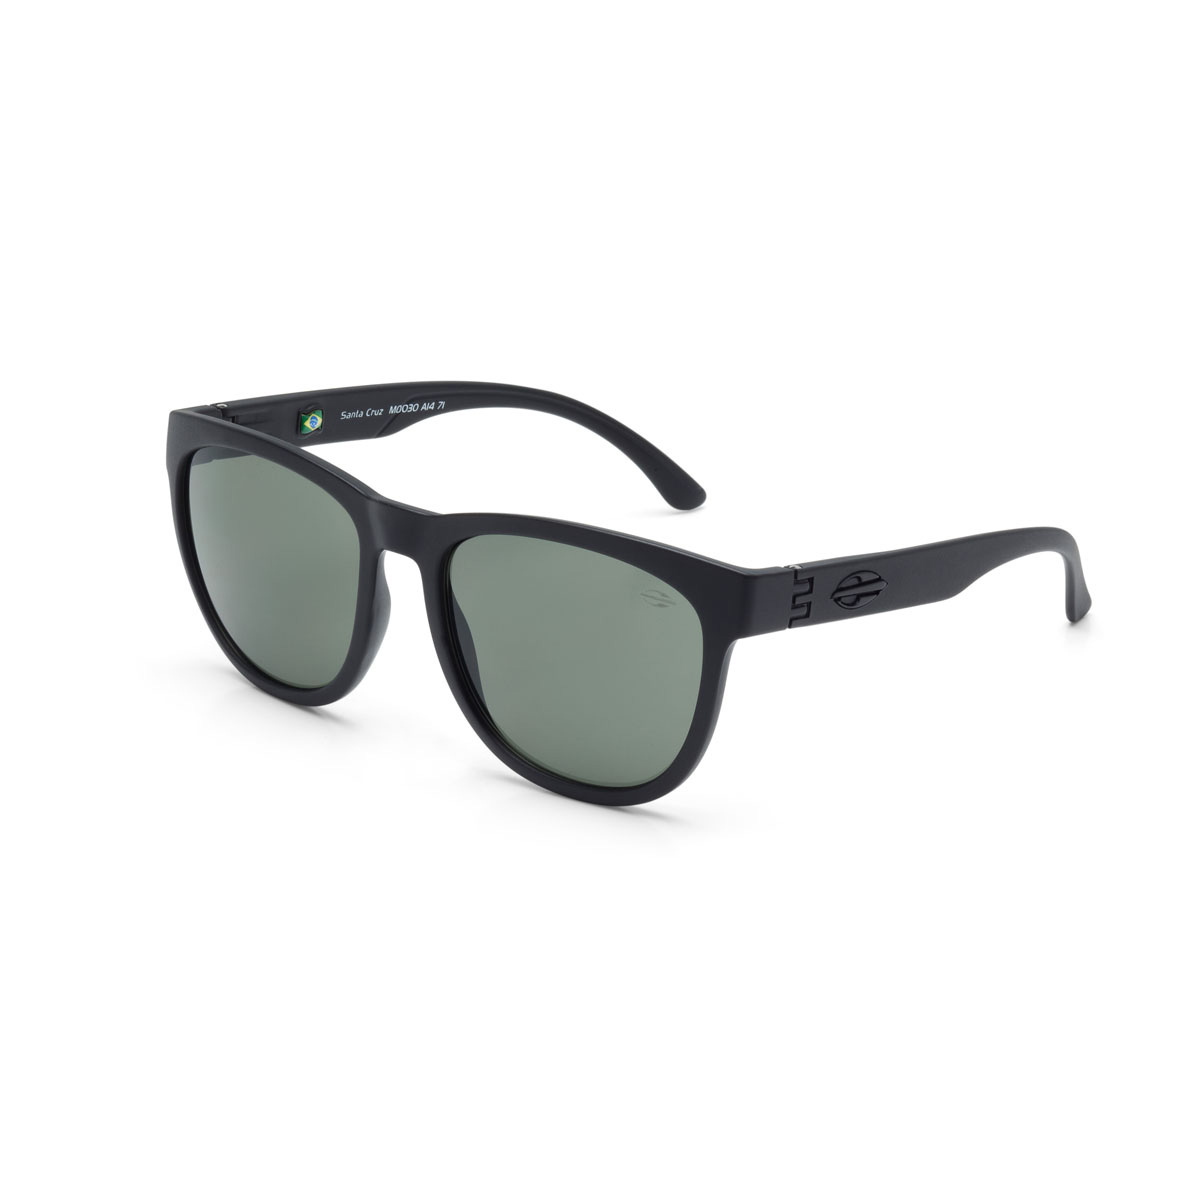 Óculos de Sol Mormaii Santa Cruz M0030A1471MormaiiMormaii de ... f3e5a43355